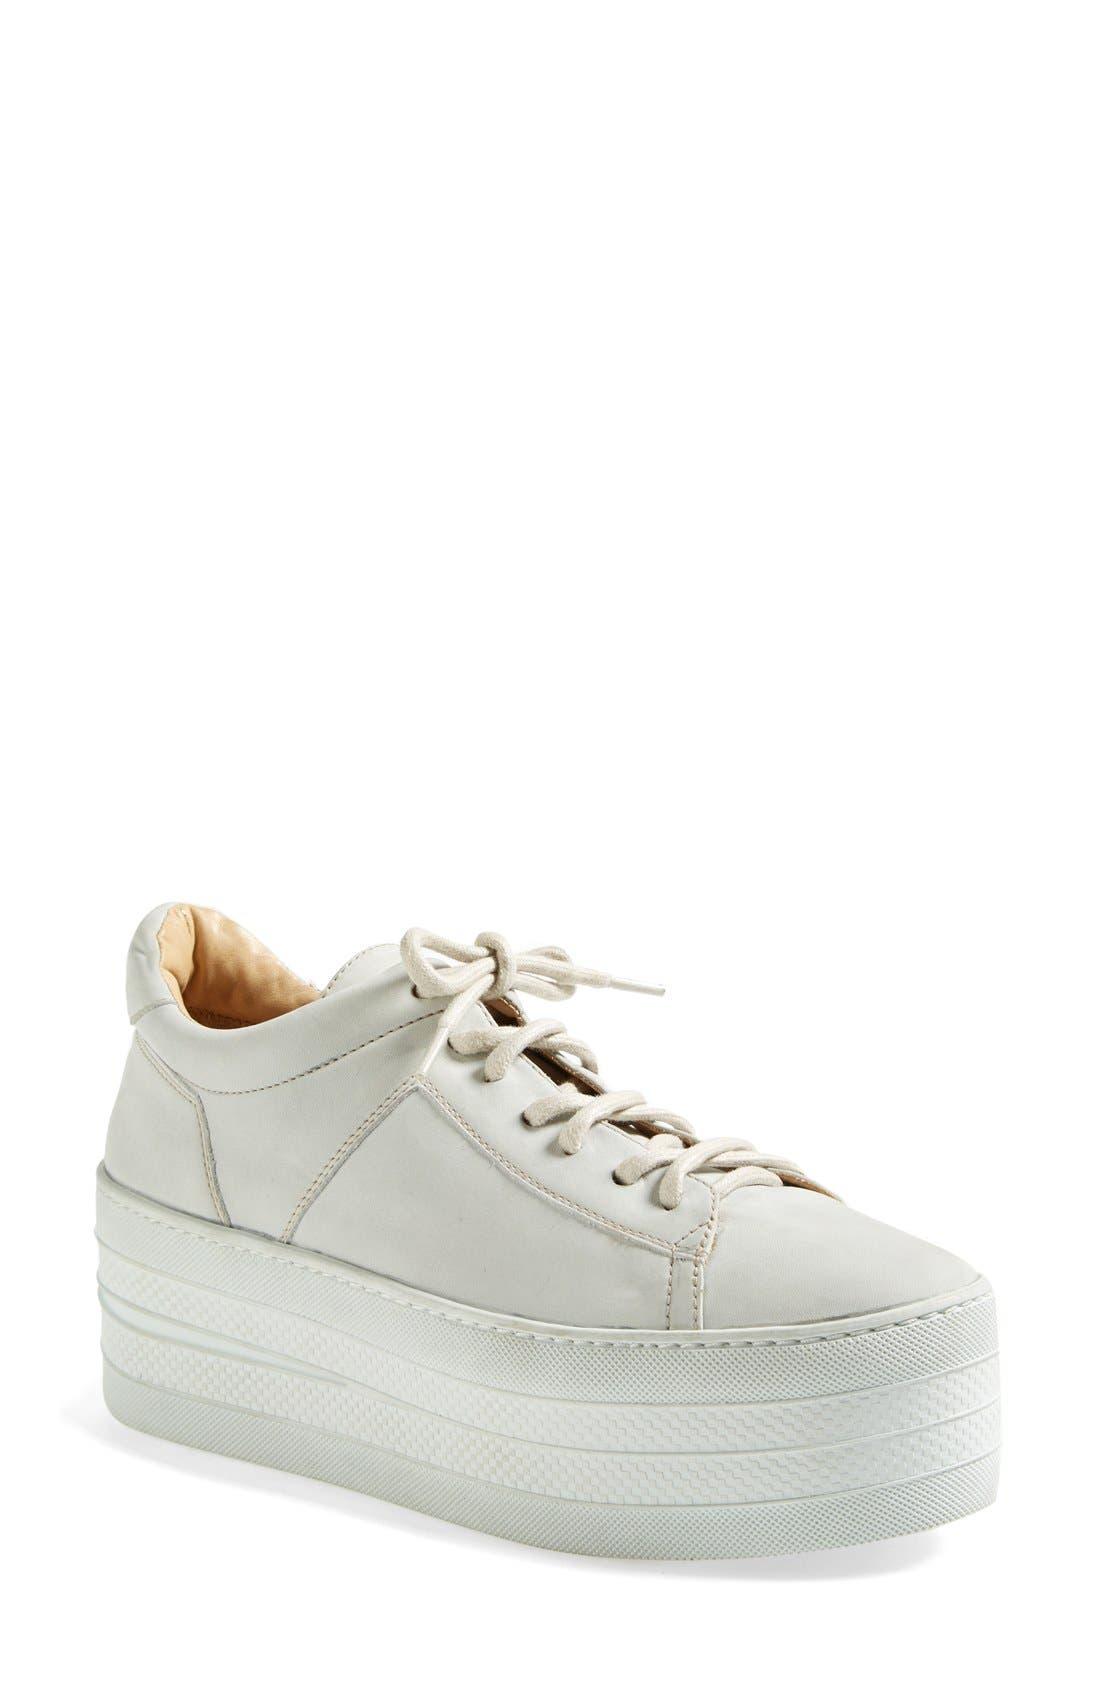 Main Image - Free Lance 'Skyla' Platform Sneaker (Women)